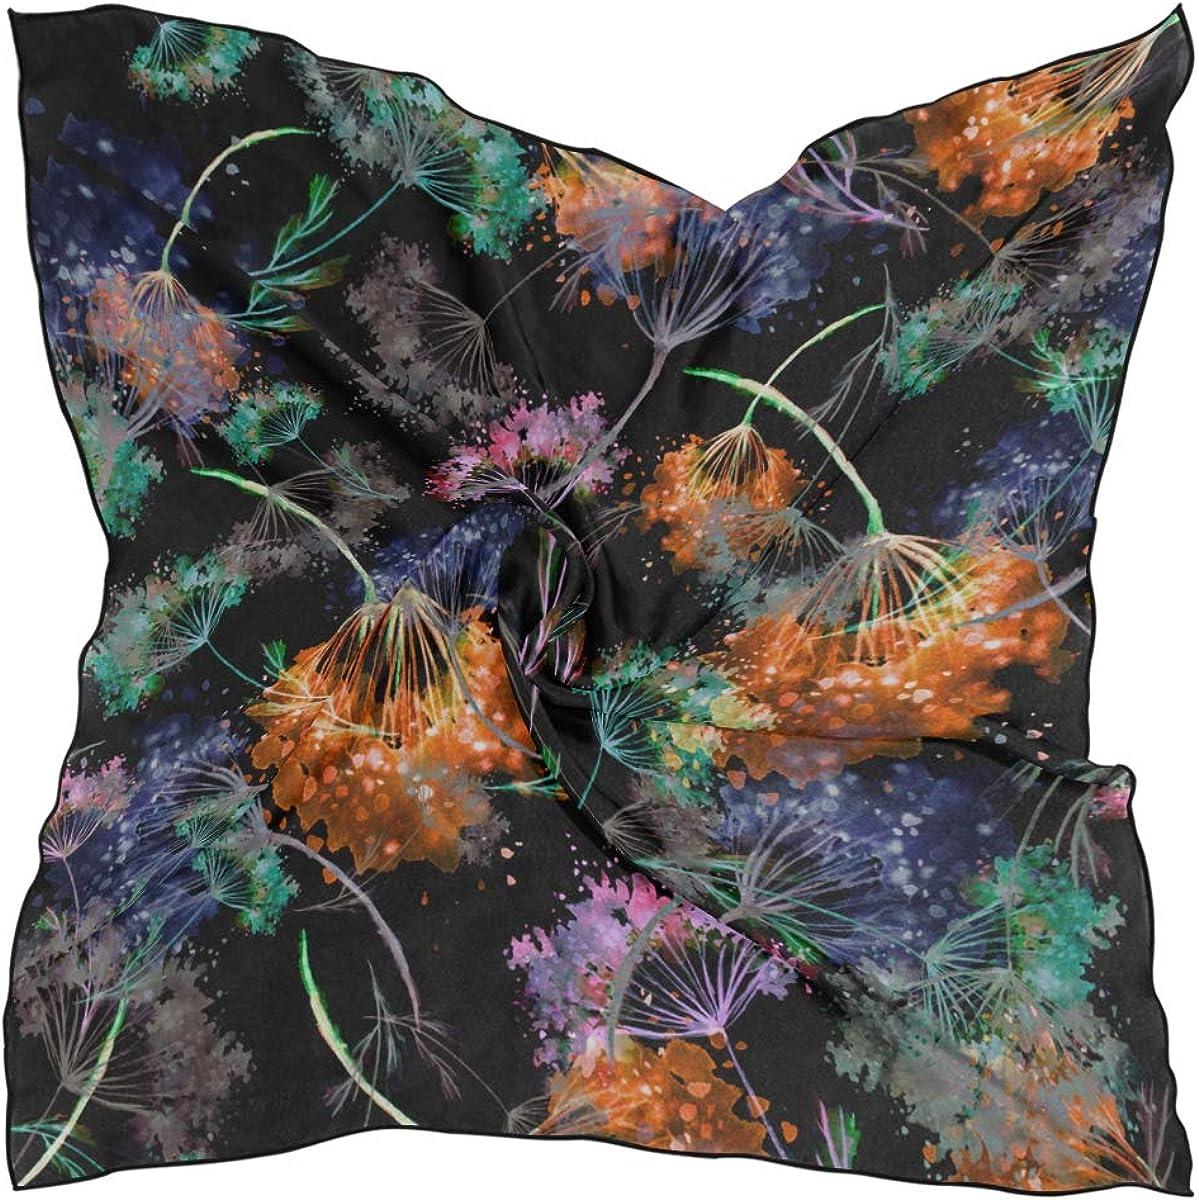 Women's Soft Polyester Silk Square Scarf Watercolor Dandelion Watercolor Floral Vibrant Garden With Nature Fashion Print Head & Hair Scarf Neckerchief Accessory-23.6x23.6 Inch